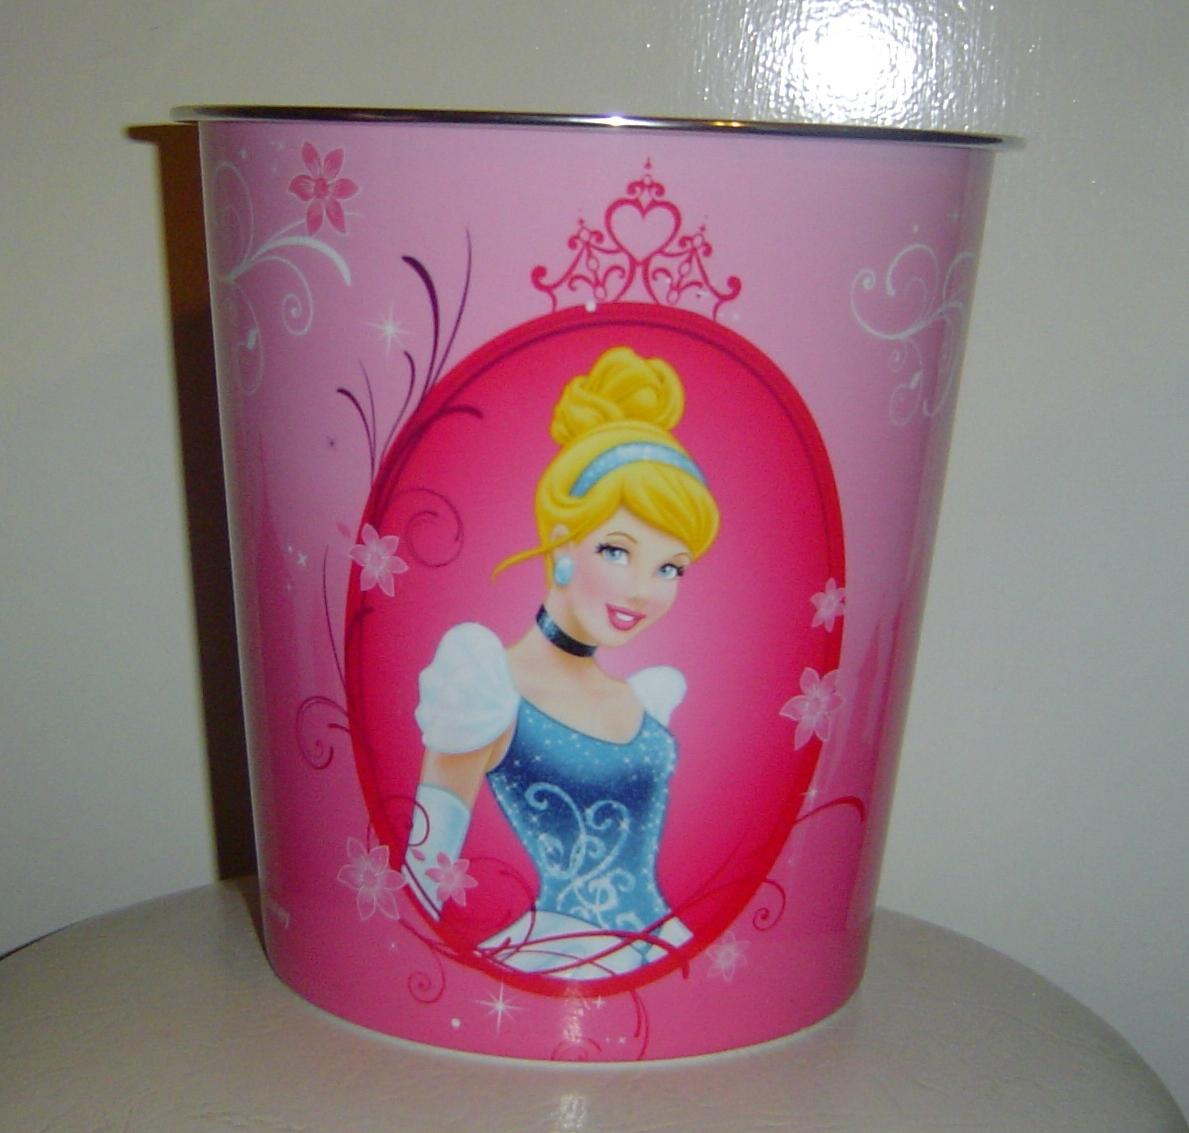 Disney princess bath set 3 piece accessory set plus for Bathroom wastebasket sets